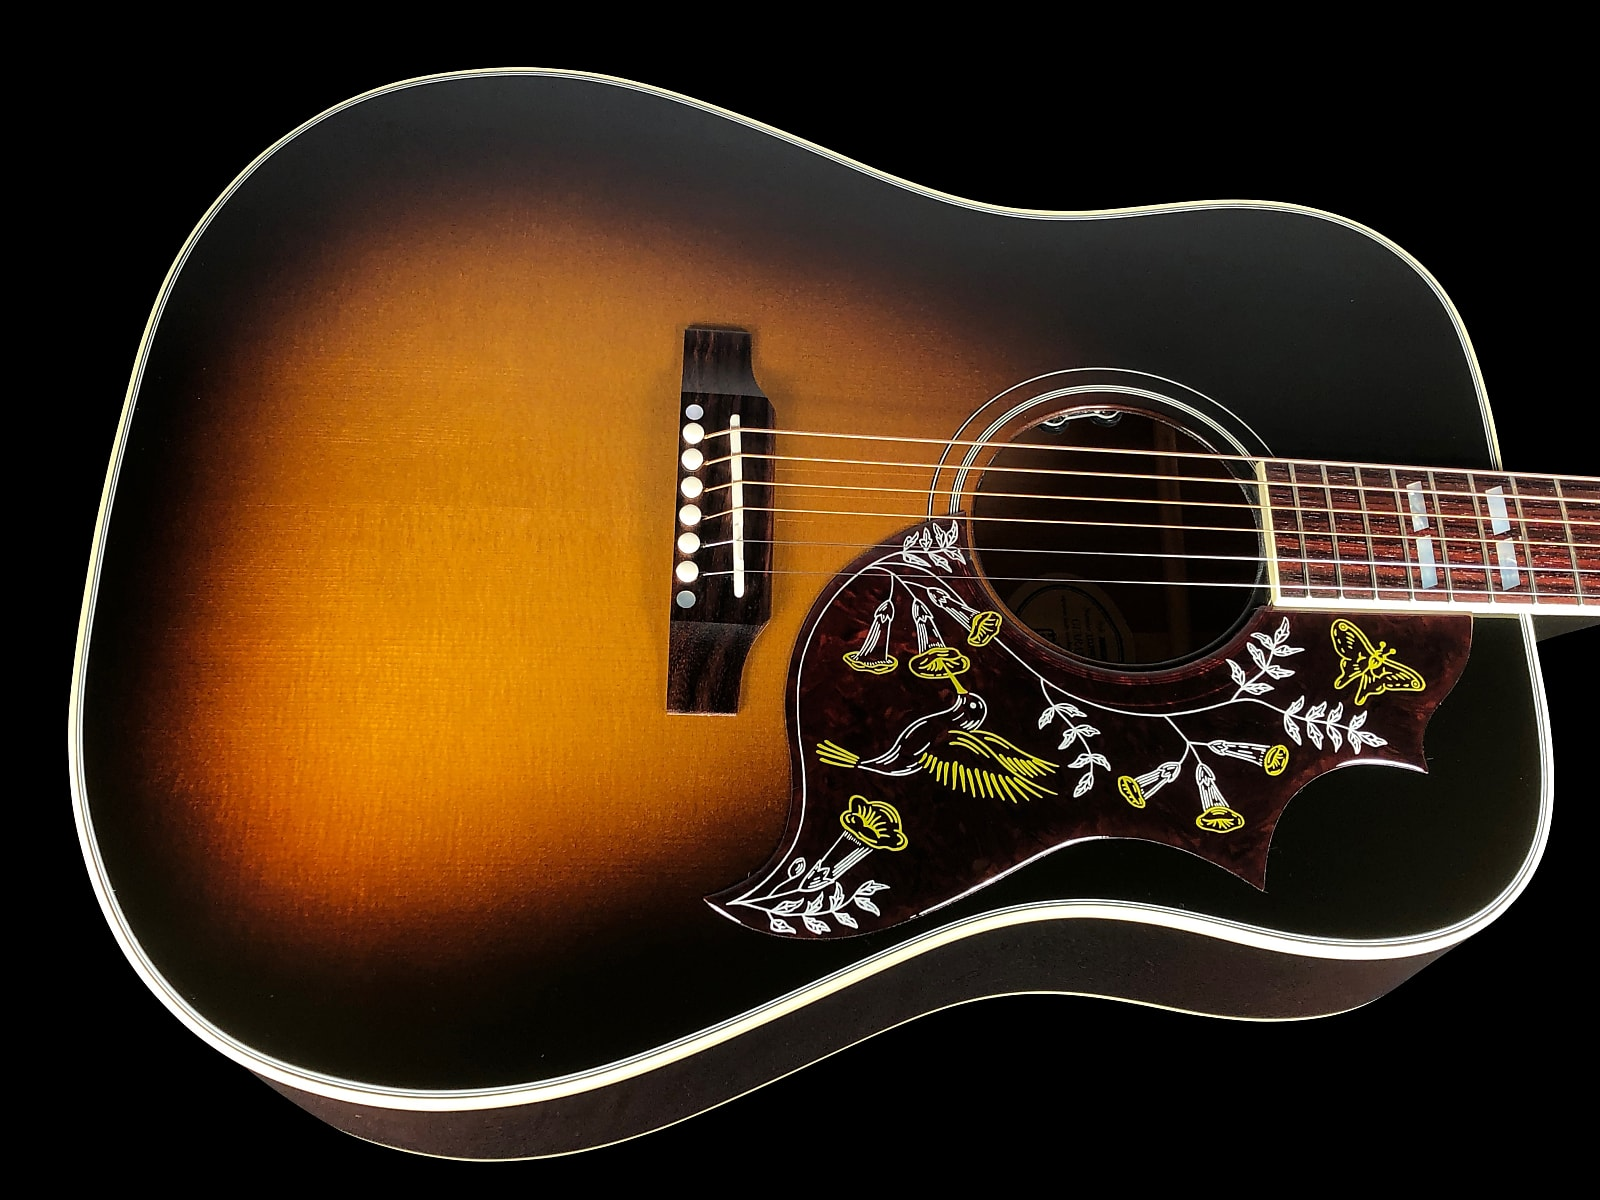 2019 Gibson Hummingbird Standard w Built-in LR Baggs ~ Vintage Sunburst